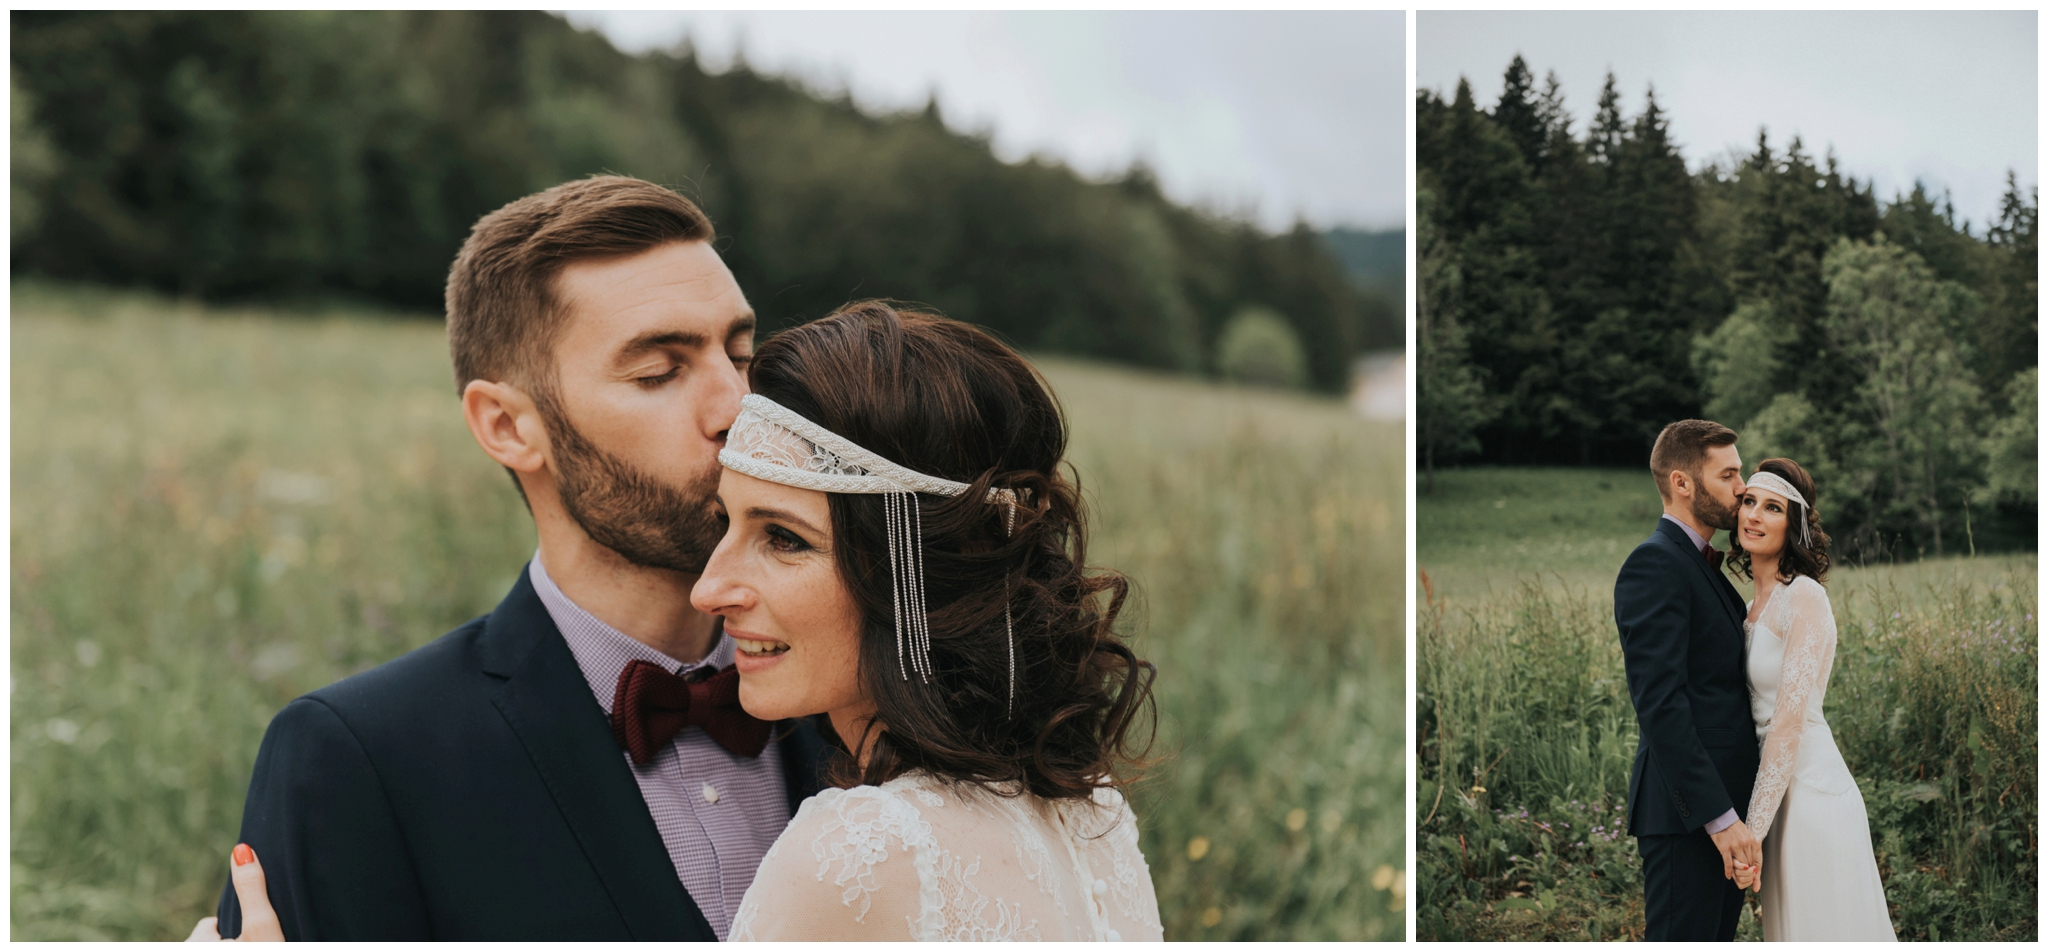 photographe-mariage-montagne-vercors-boho-folk-grenoble-annecy-alpes_0035